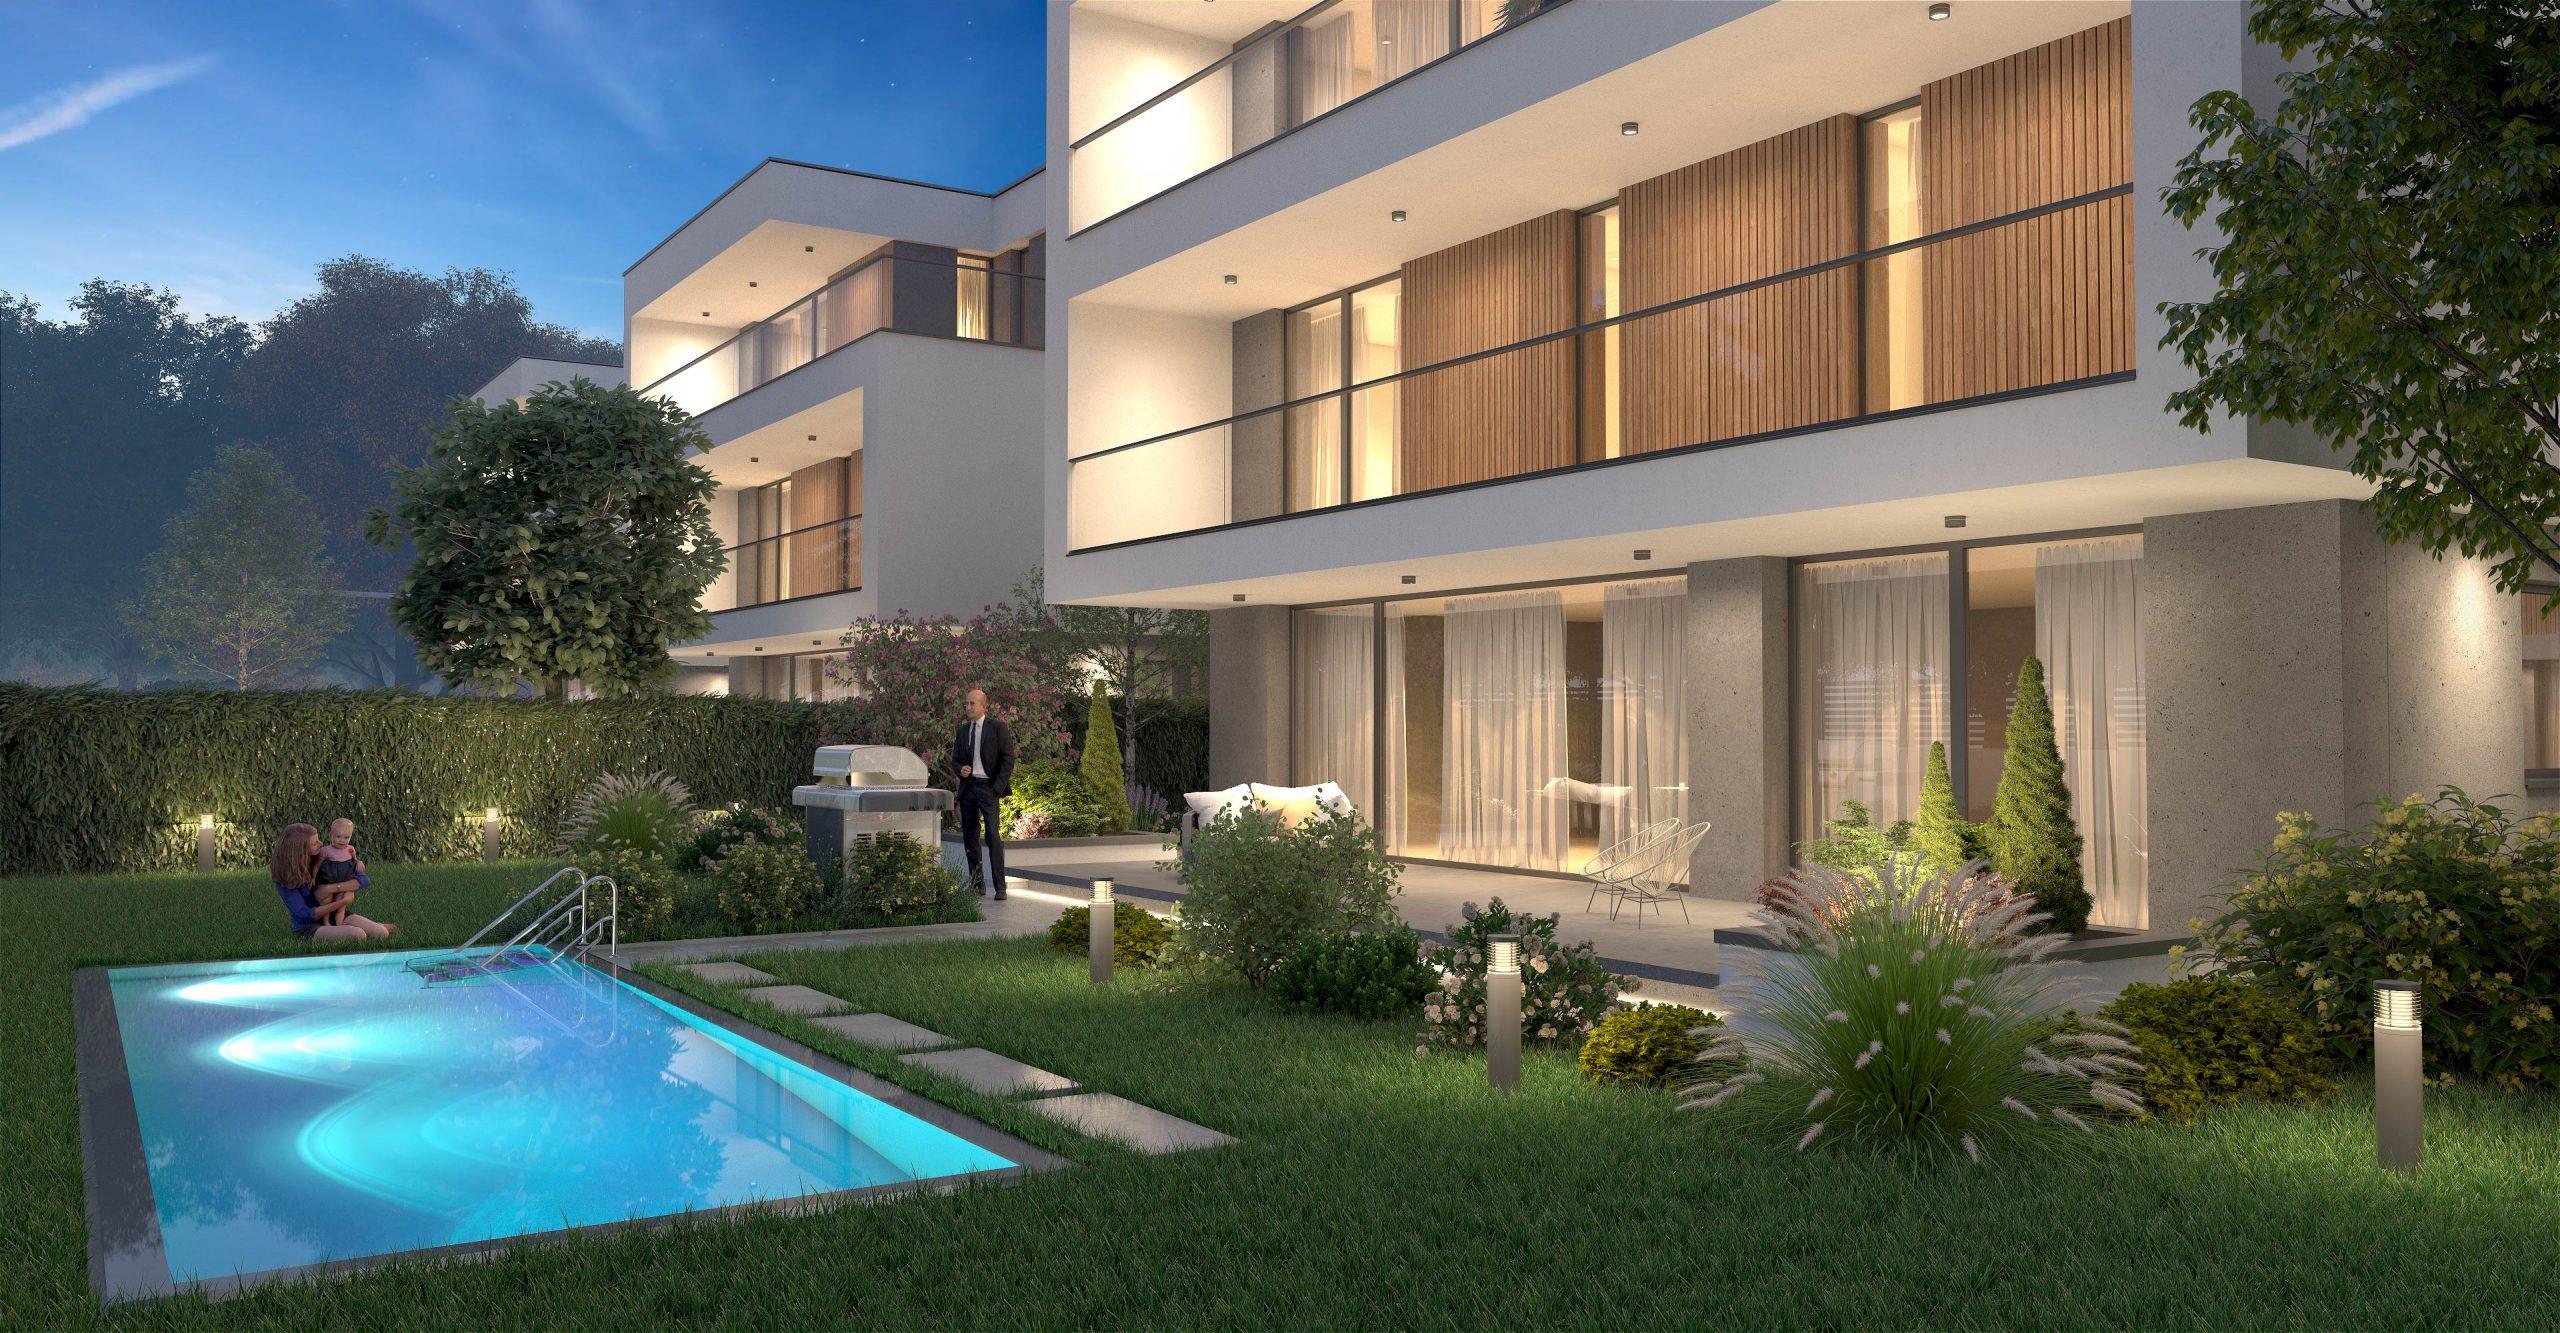 Residence5 Villas_Vila A_Pipera, 7 camere_vila 8